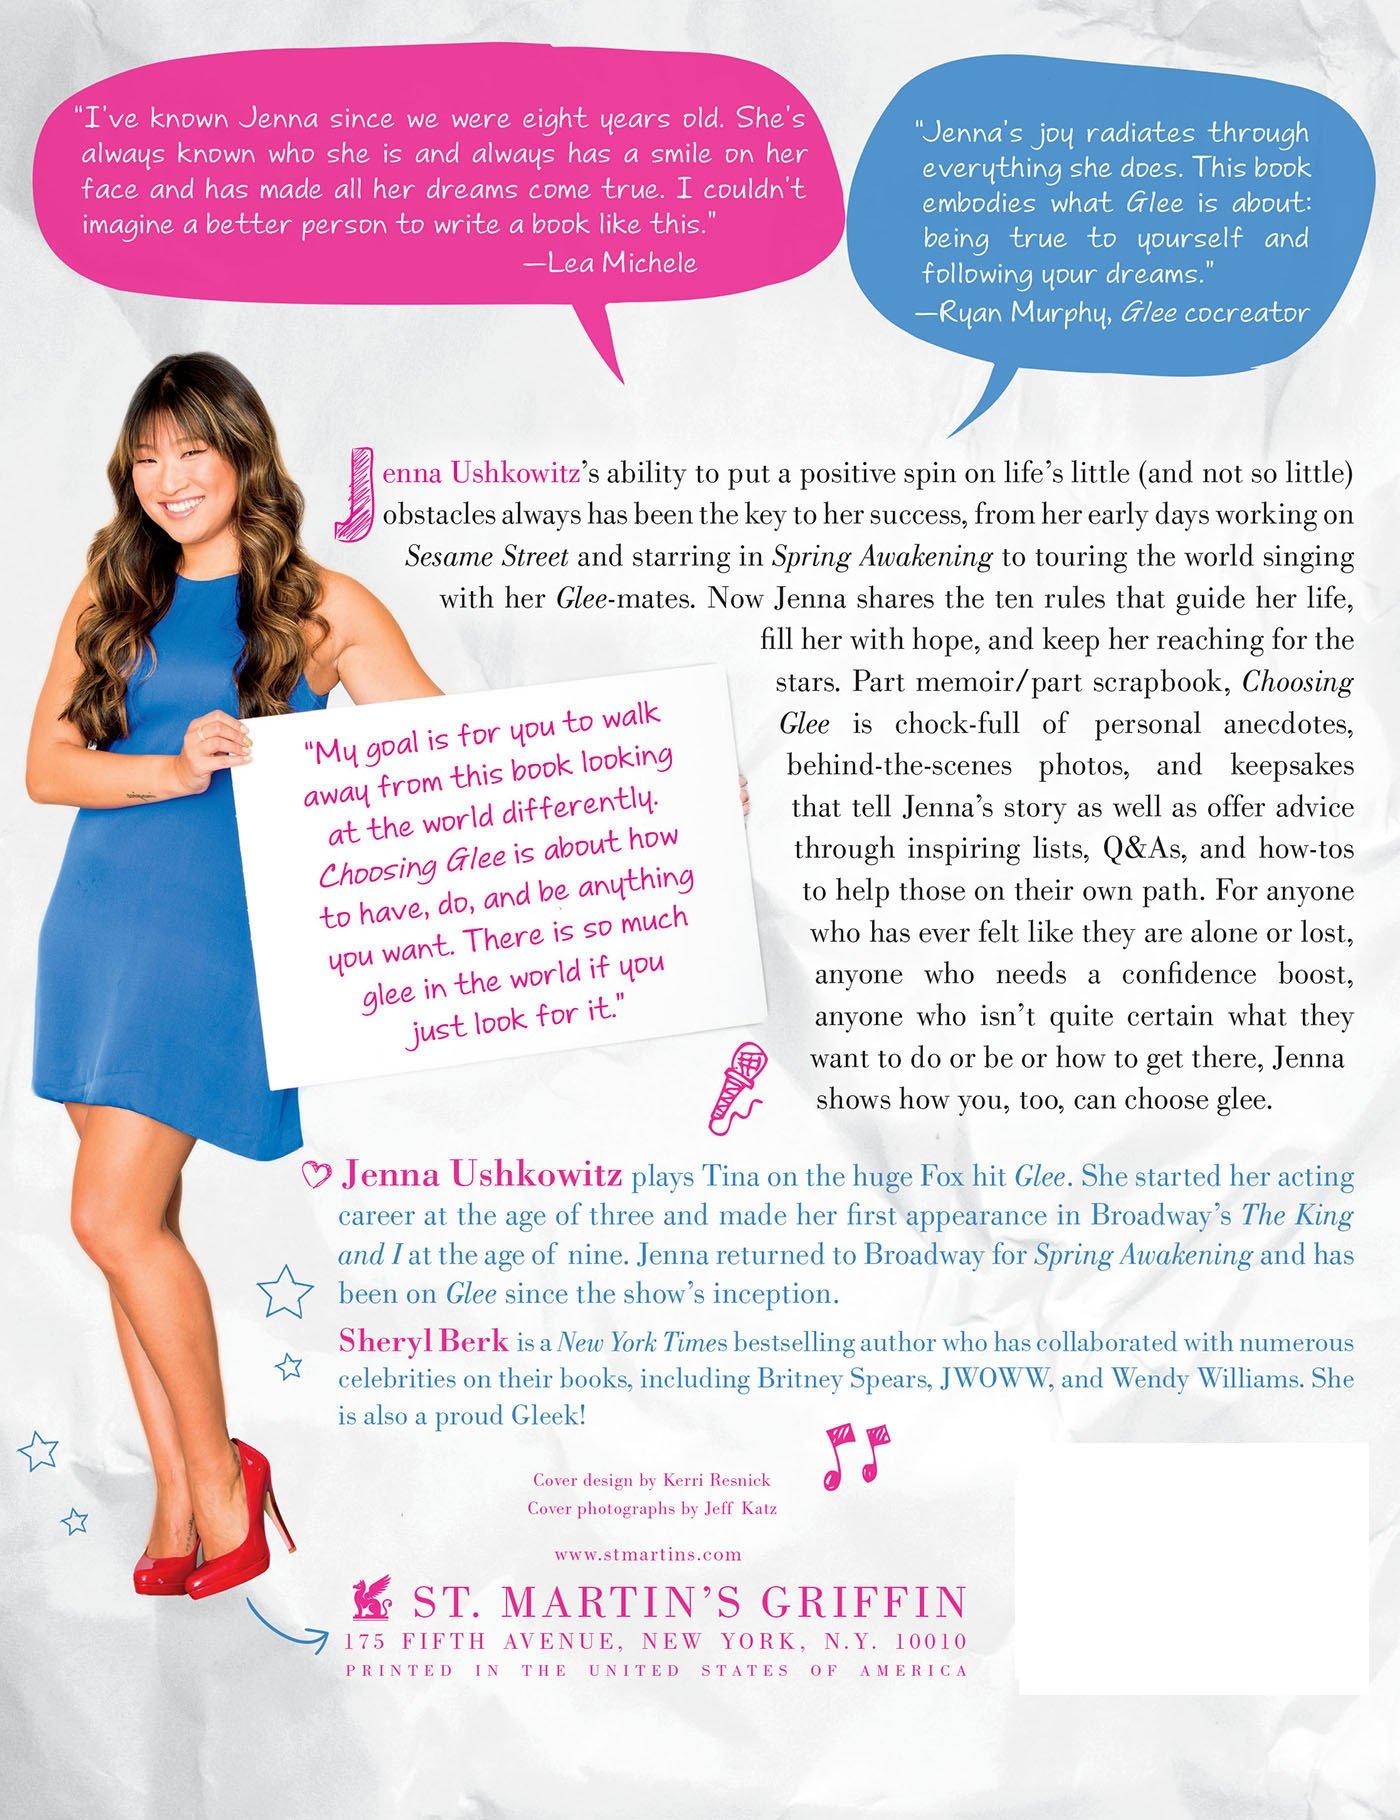 Choosing Glee: 10 Rules to Finding Inspiration, Happiness, and the Real  You: Jenna Ushkowitz, Sheryl Berk: 9781250030610: Amazon.com: Books